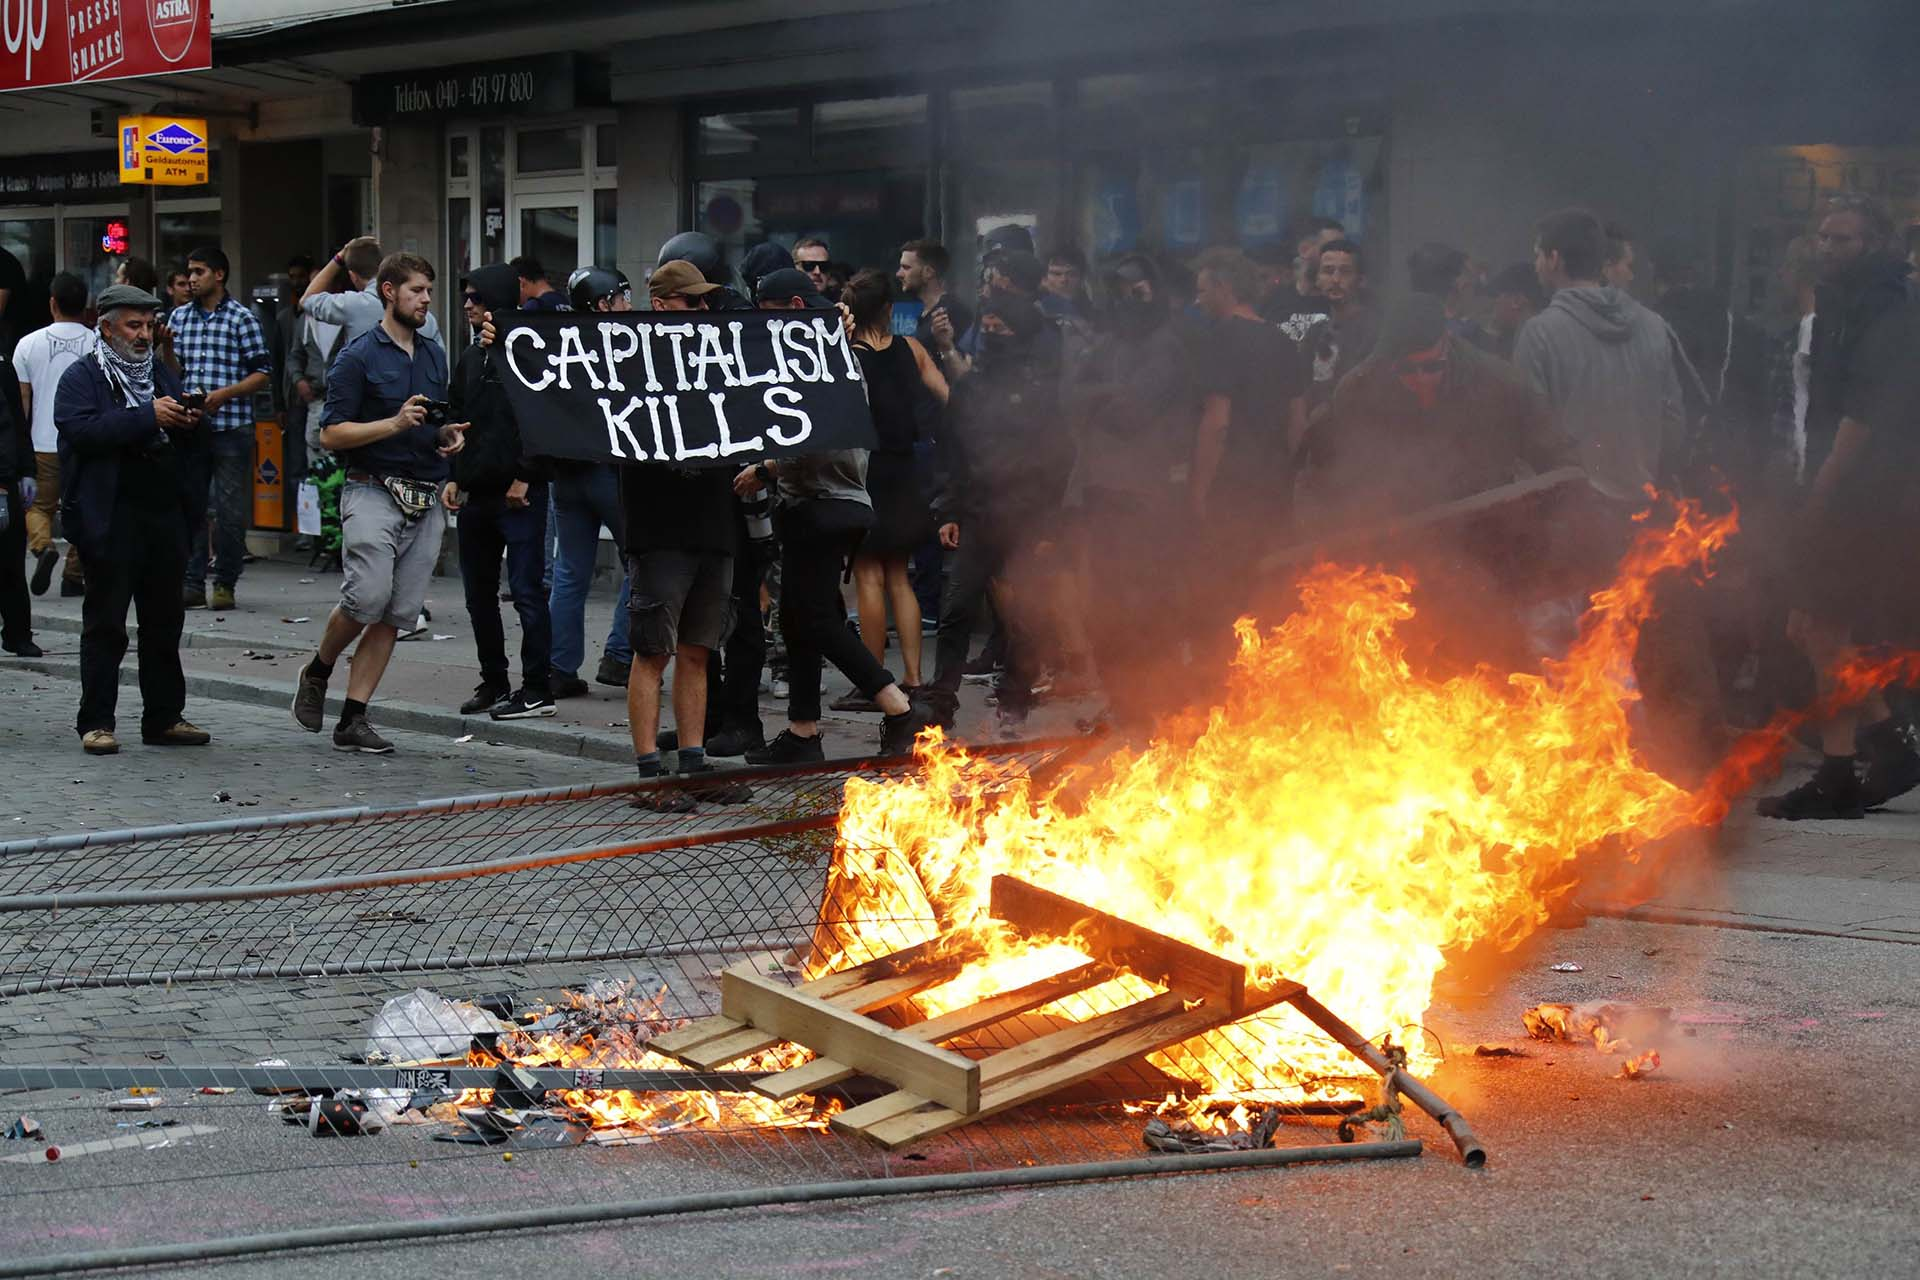 """El capitalismo mata"", reza un cartel de los manifestantes en Hamburgo (Reuters)"